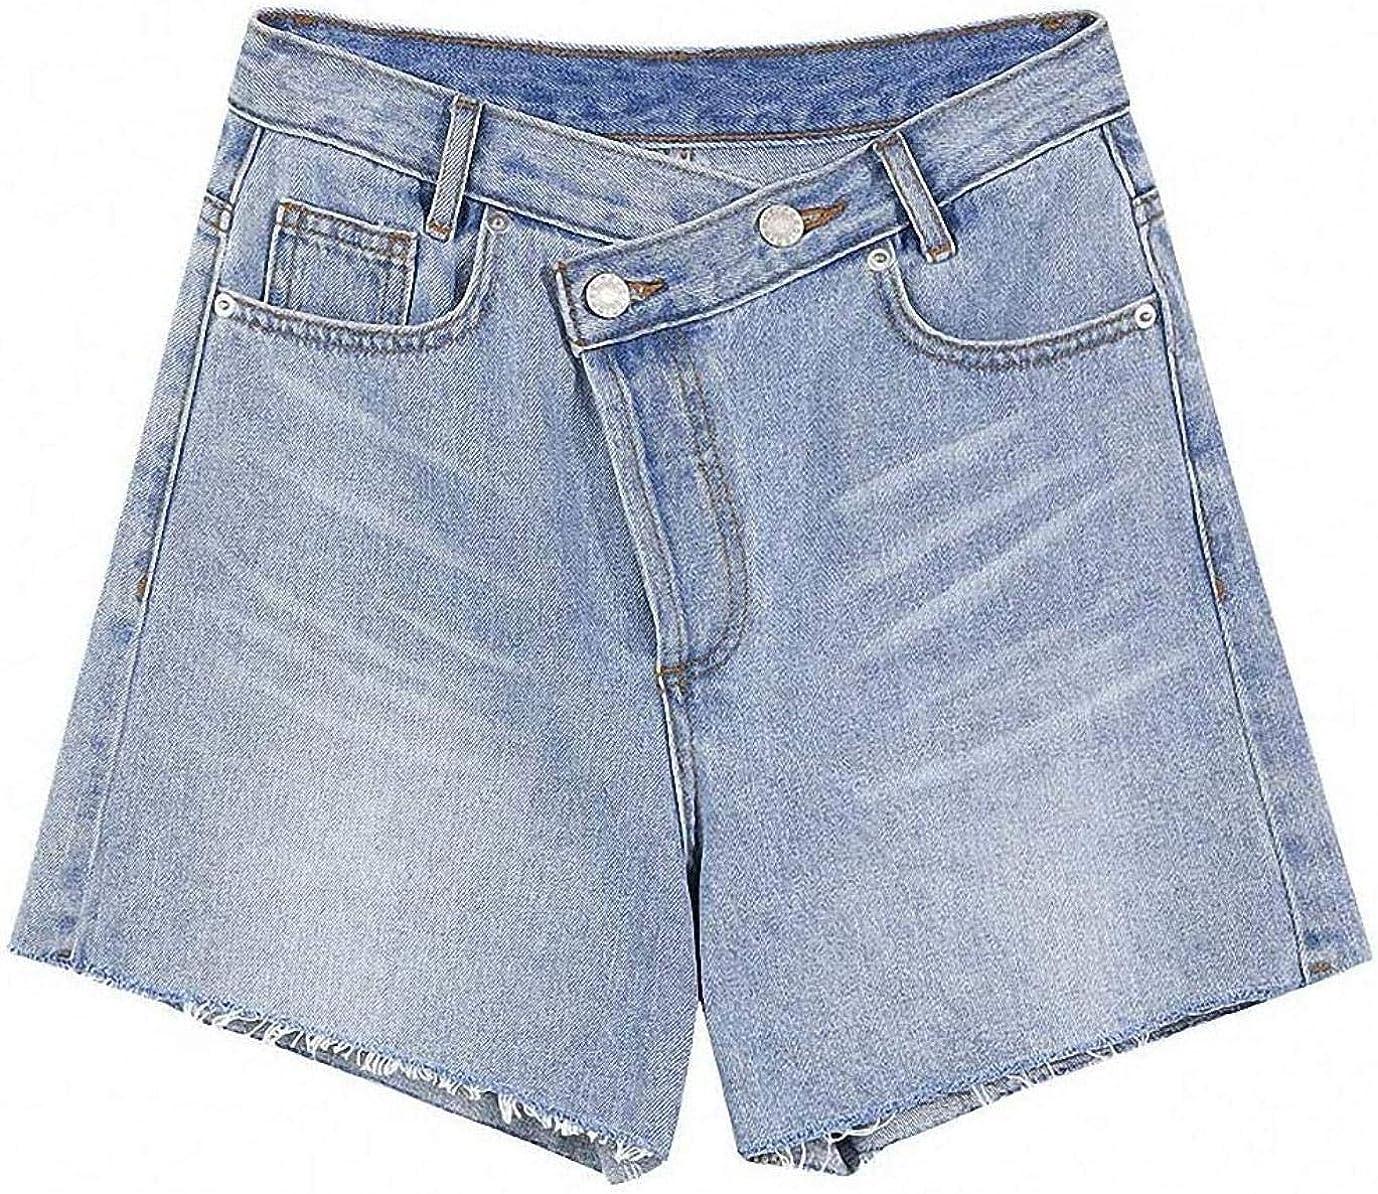 Tayaho Blue High Waist Casual Denim Shorts Women Spring Pure Raw Hem Irregular Ladies Basic Daily Bottom